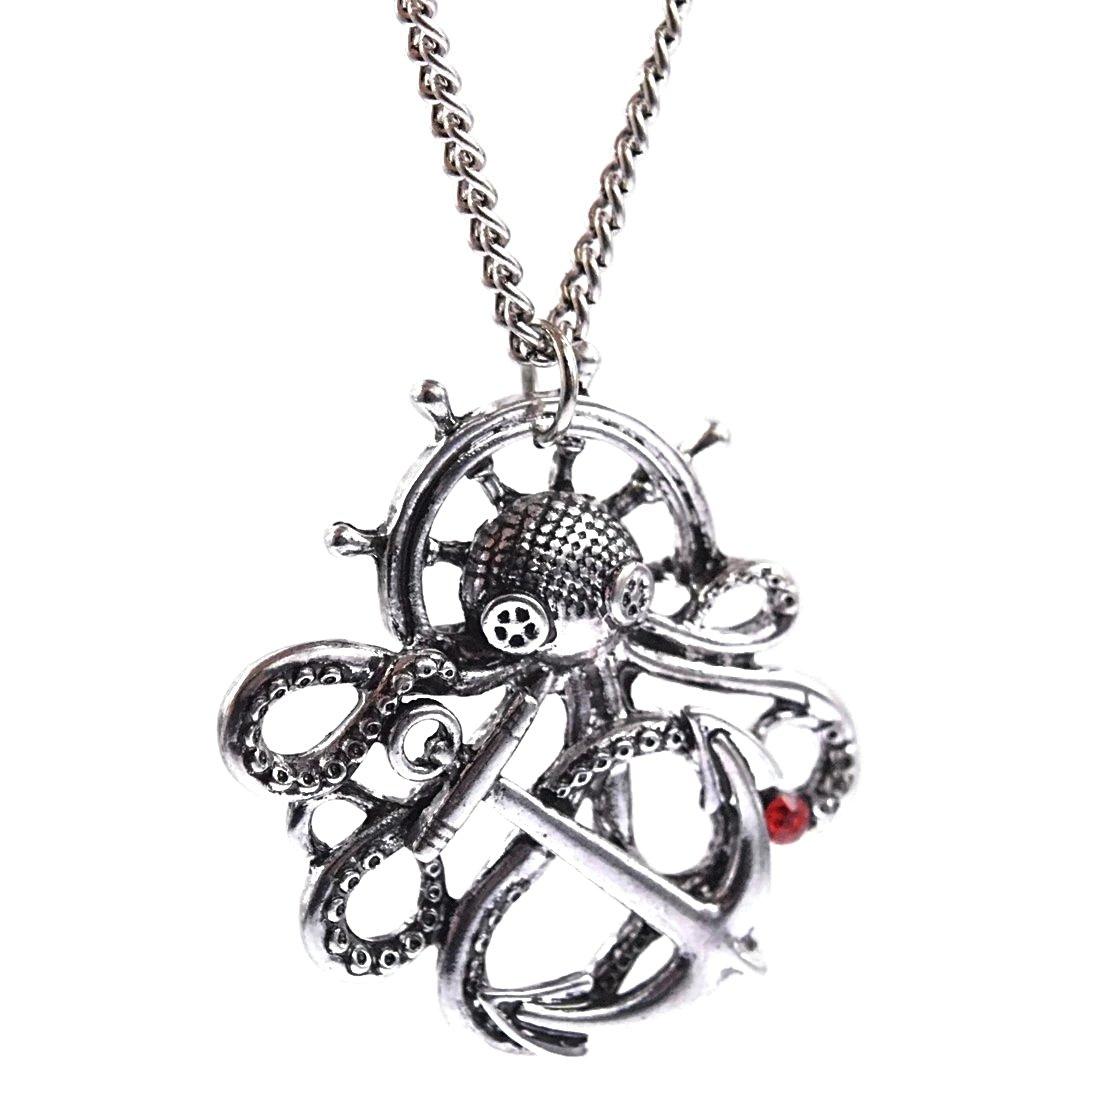 Amazon.com: Bling Cartel Octopus Steampunk Necklace Silver ...